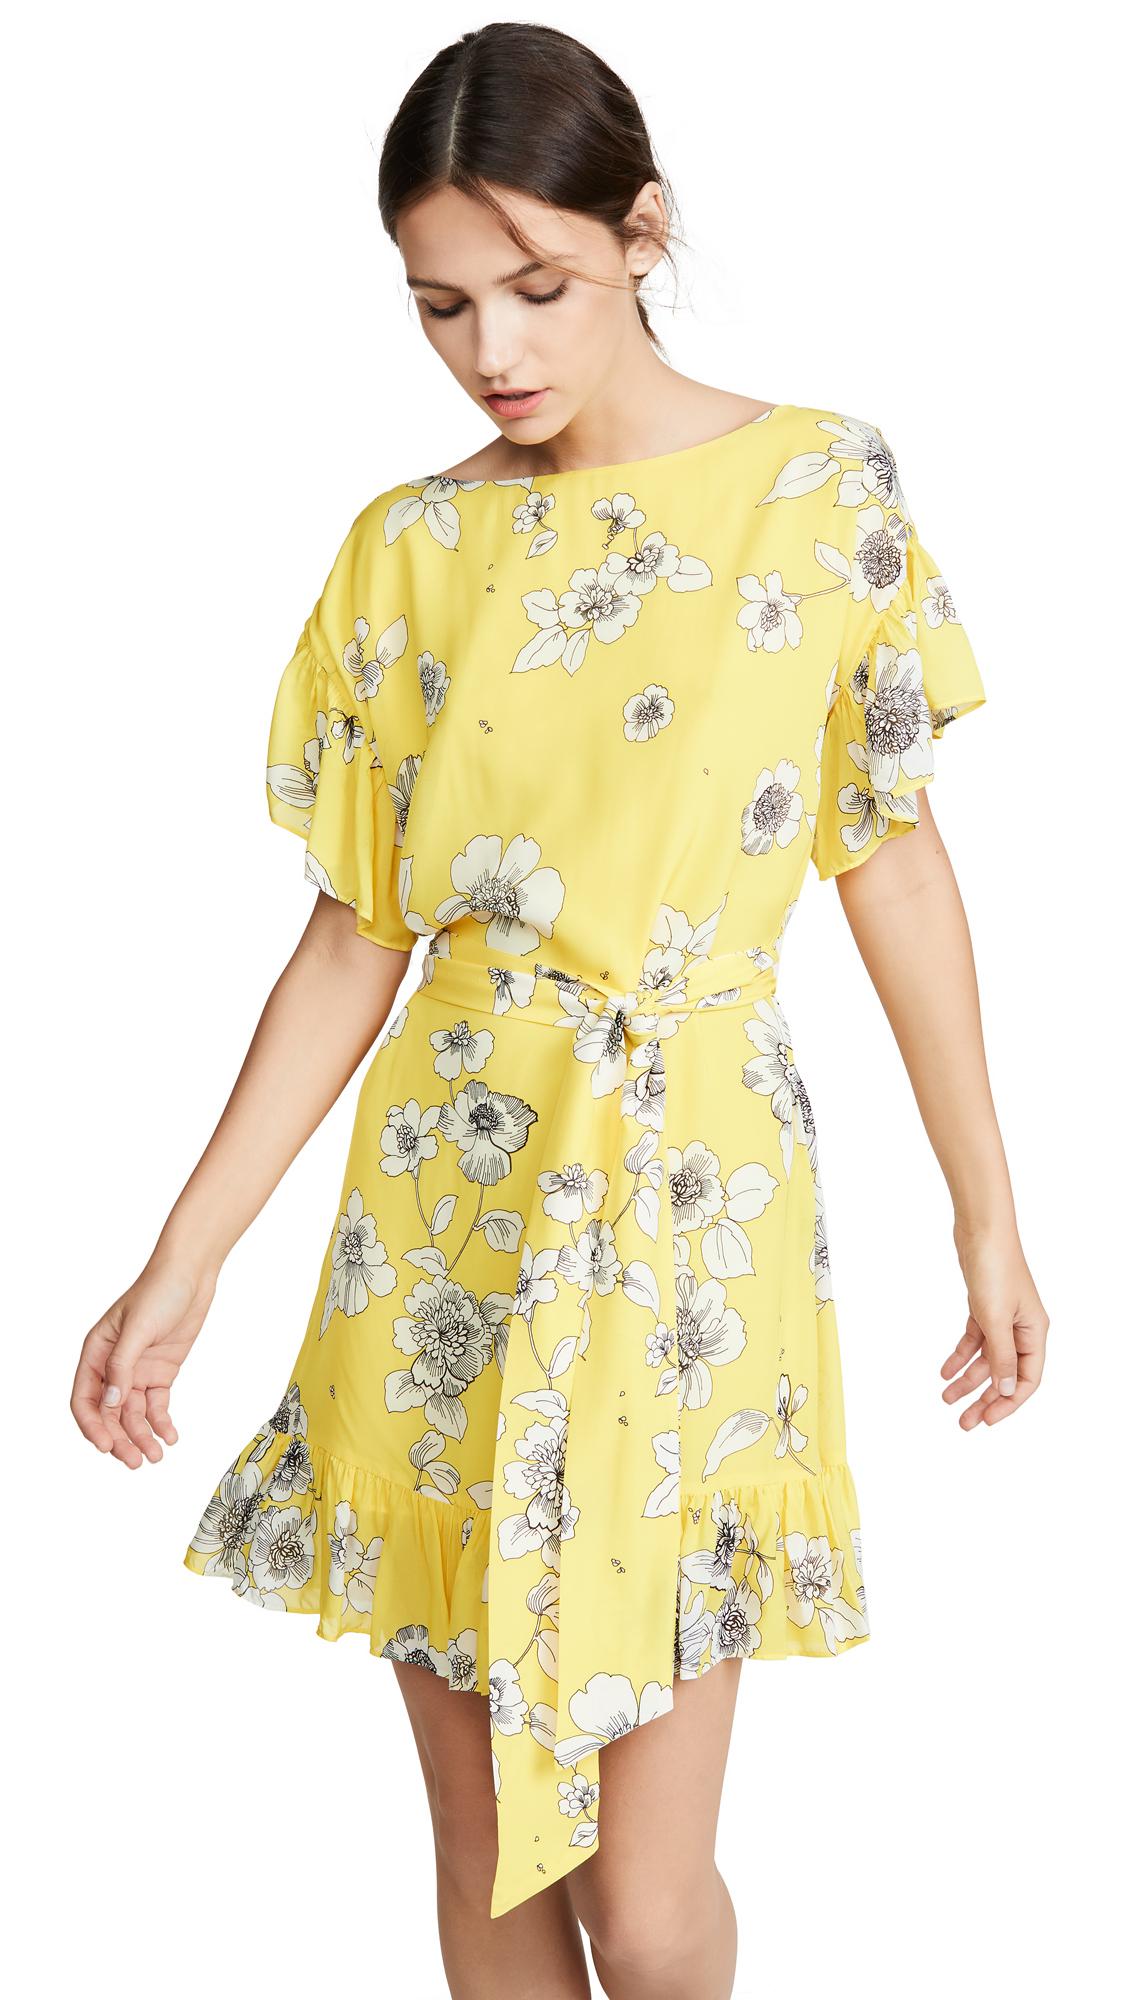 alice + olivia Ellamae Drop Shoulder Ruffle Sleeve Dress - Begonia Citrus